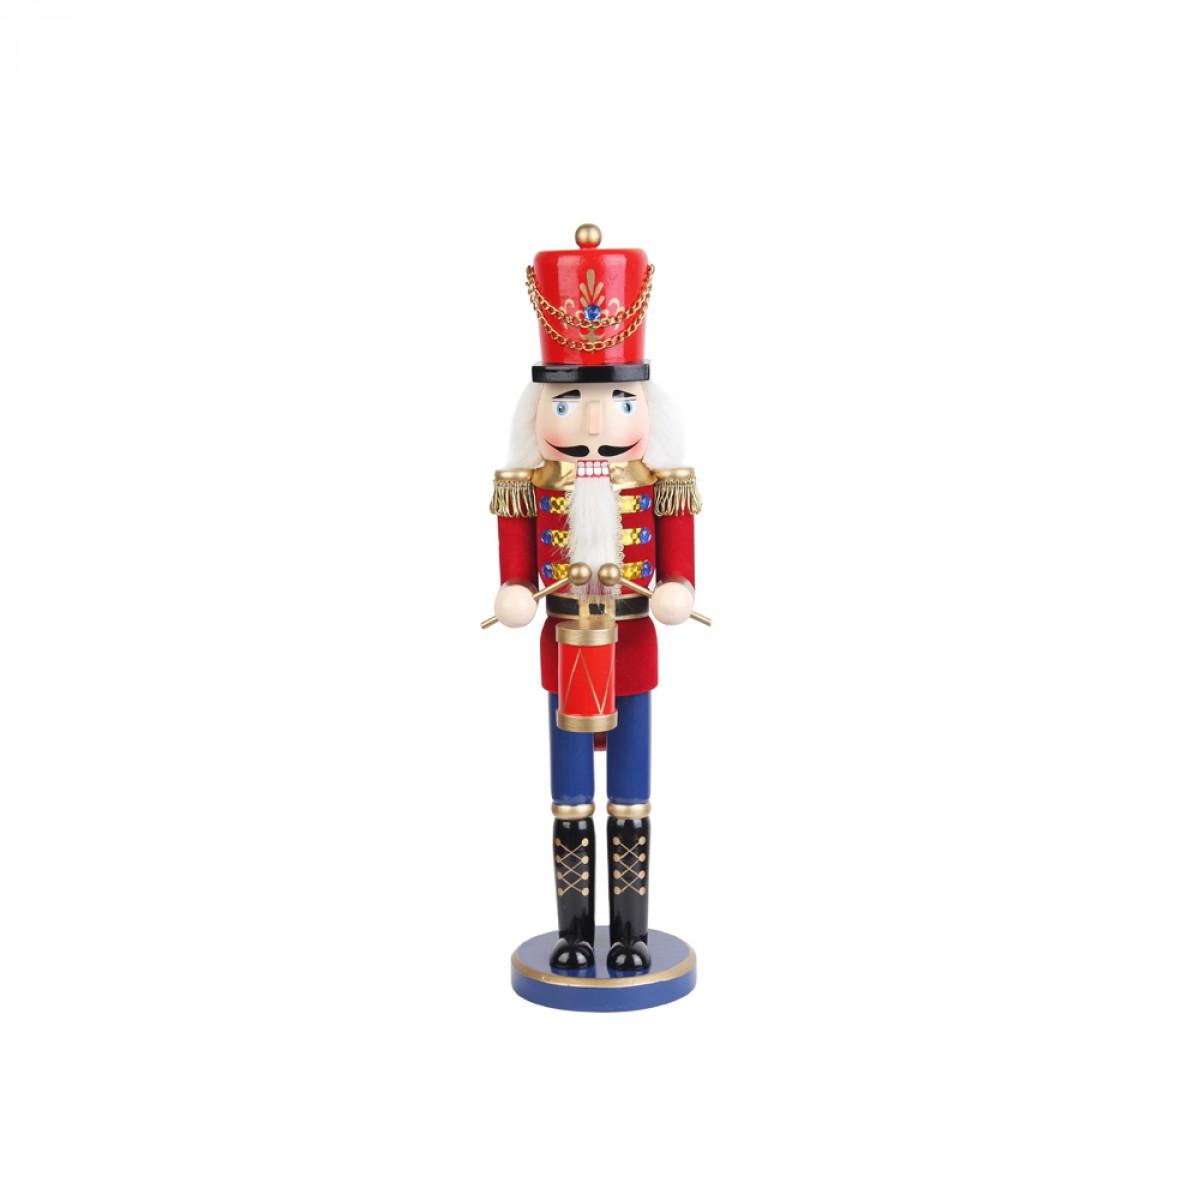 Christmas 18 inch red nutcracker drummer soldier for Floor nutcracker